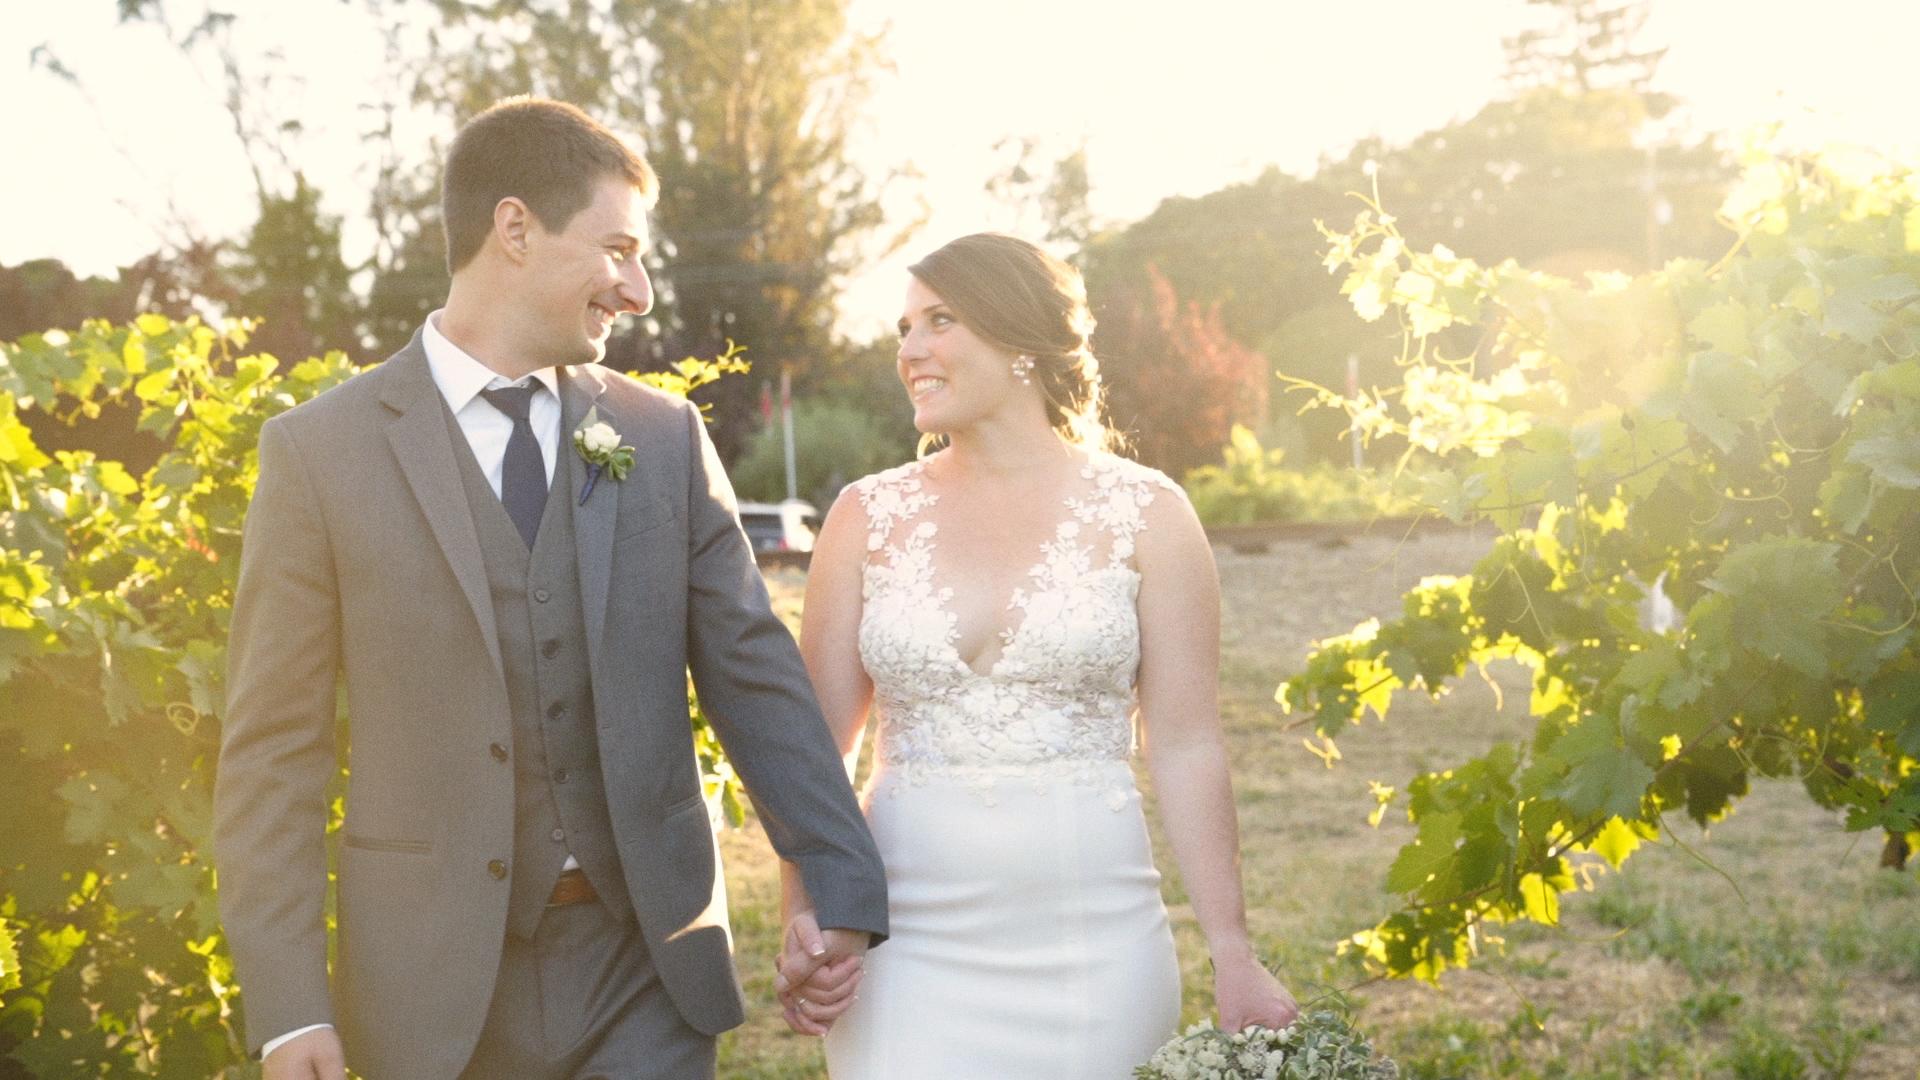 Sarah + John | Geyserville, California | Trentadue